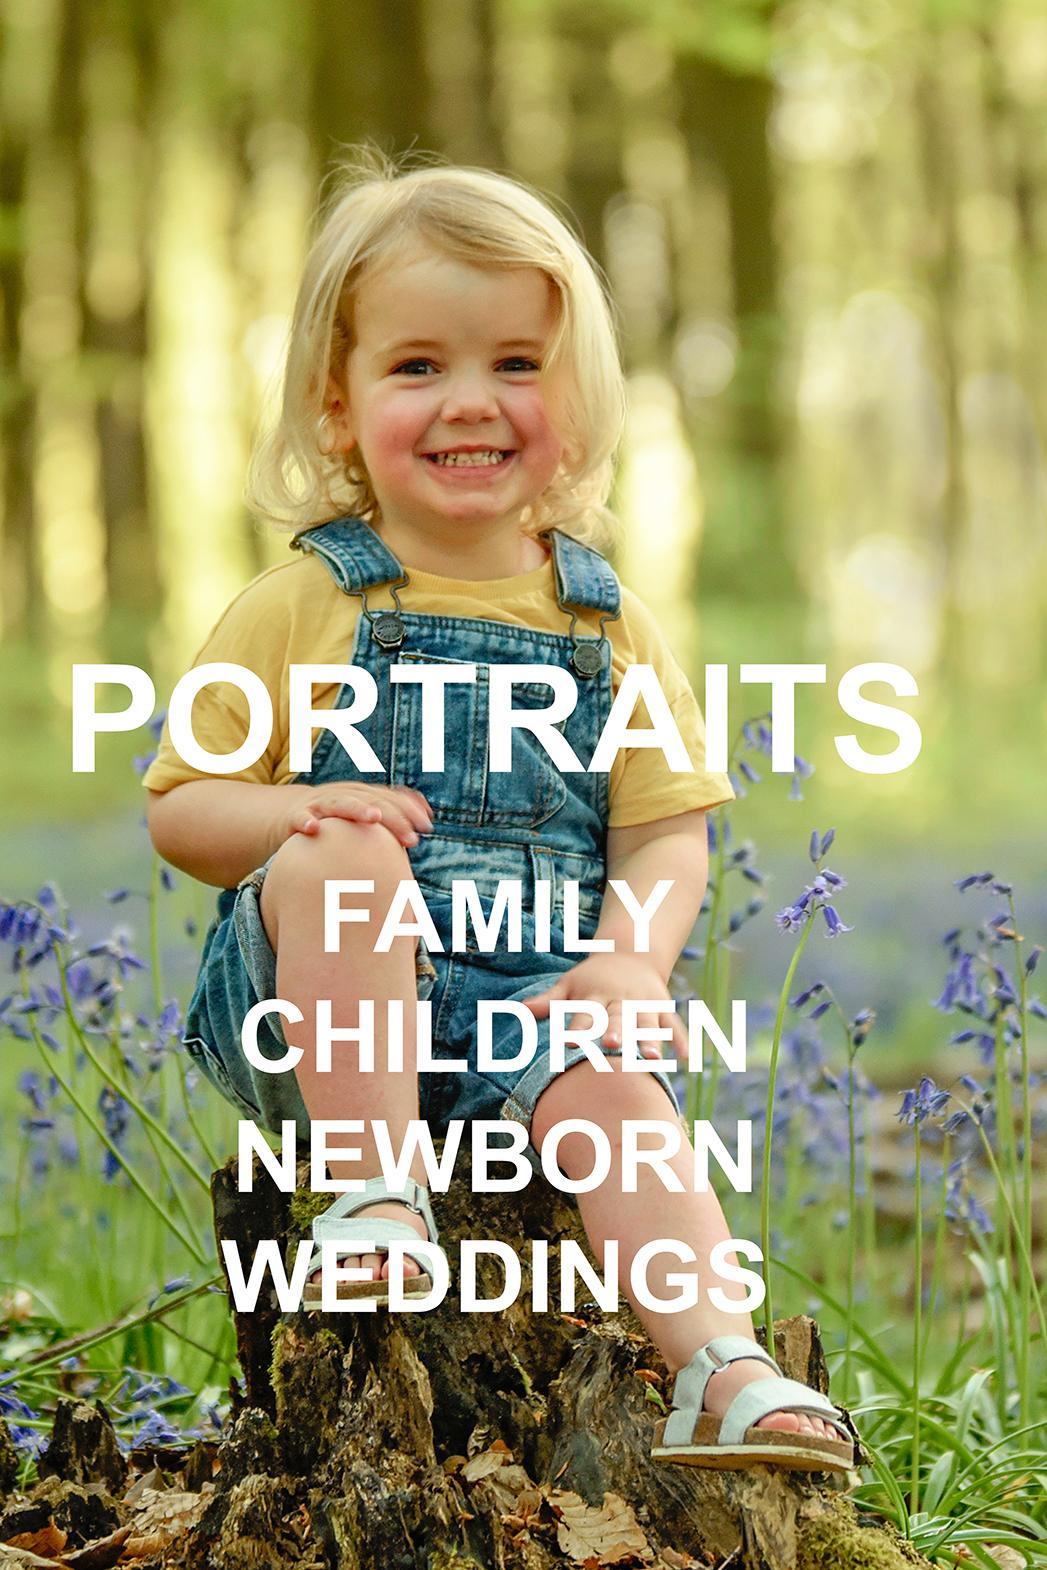 family portraits newborn wedding basingstoke hampshire.jpg